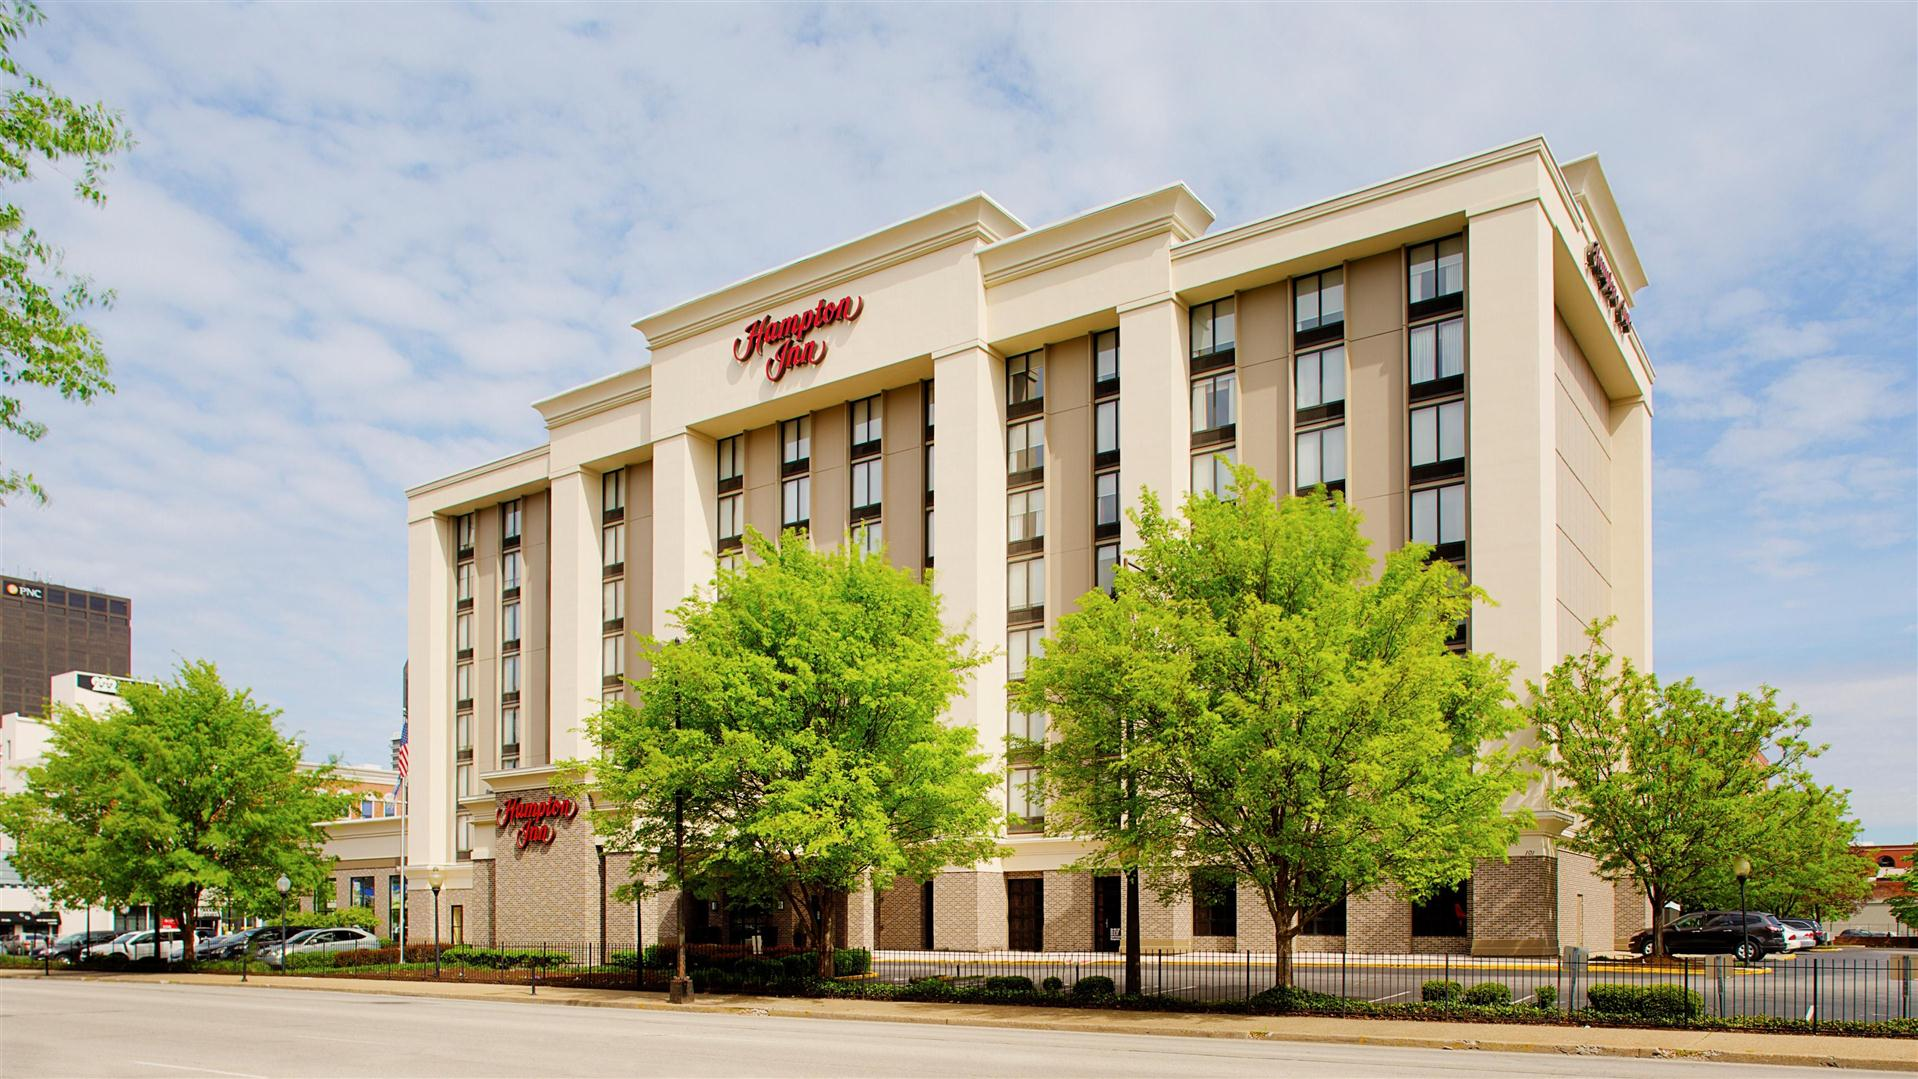 hampton inn louisville downtown - Hilton Garden Inn Louisville Downtown